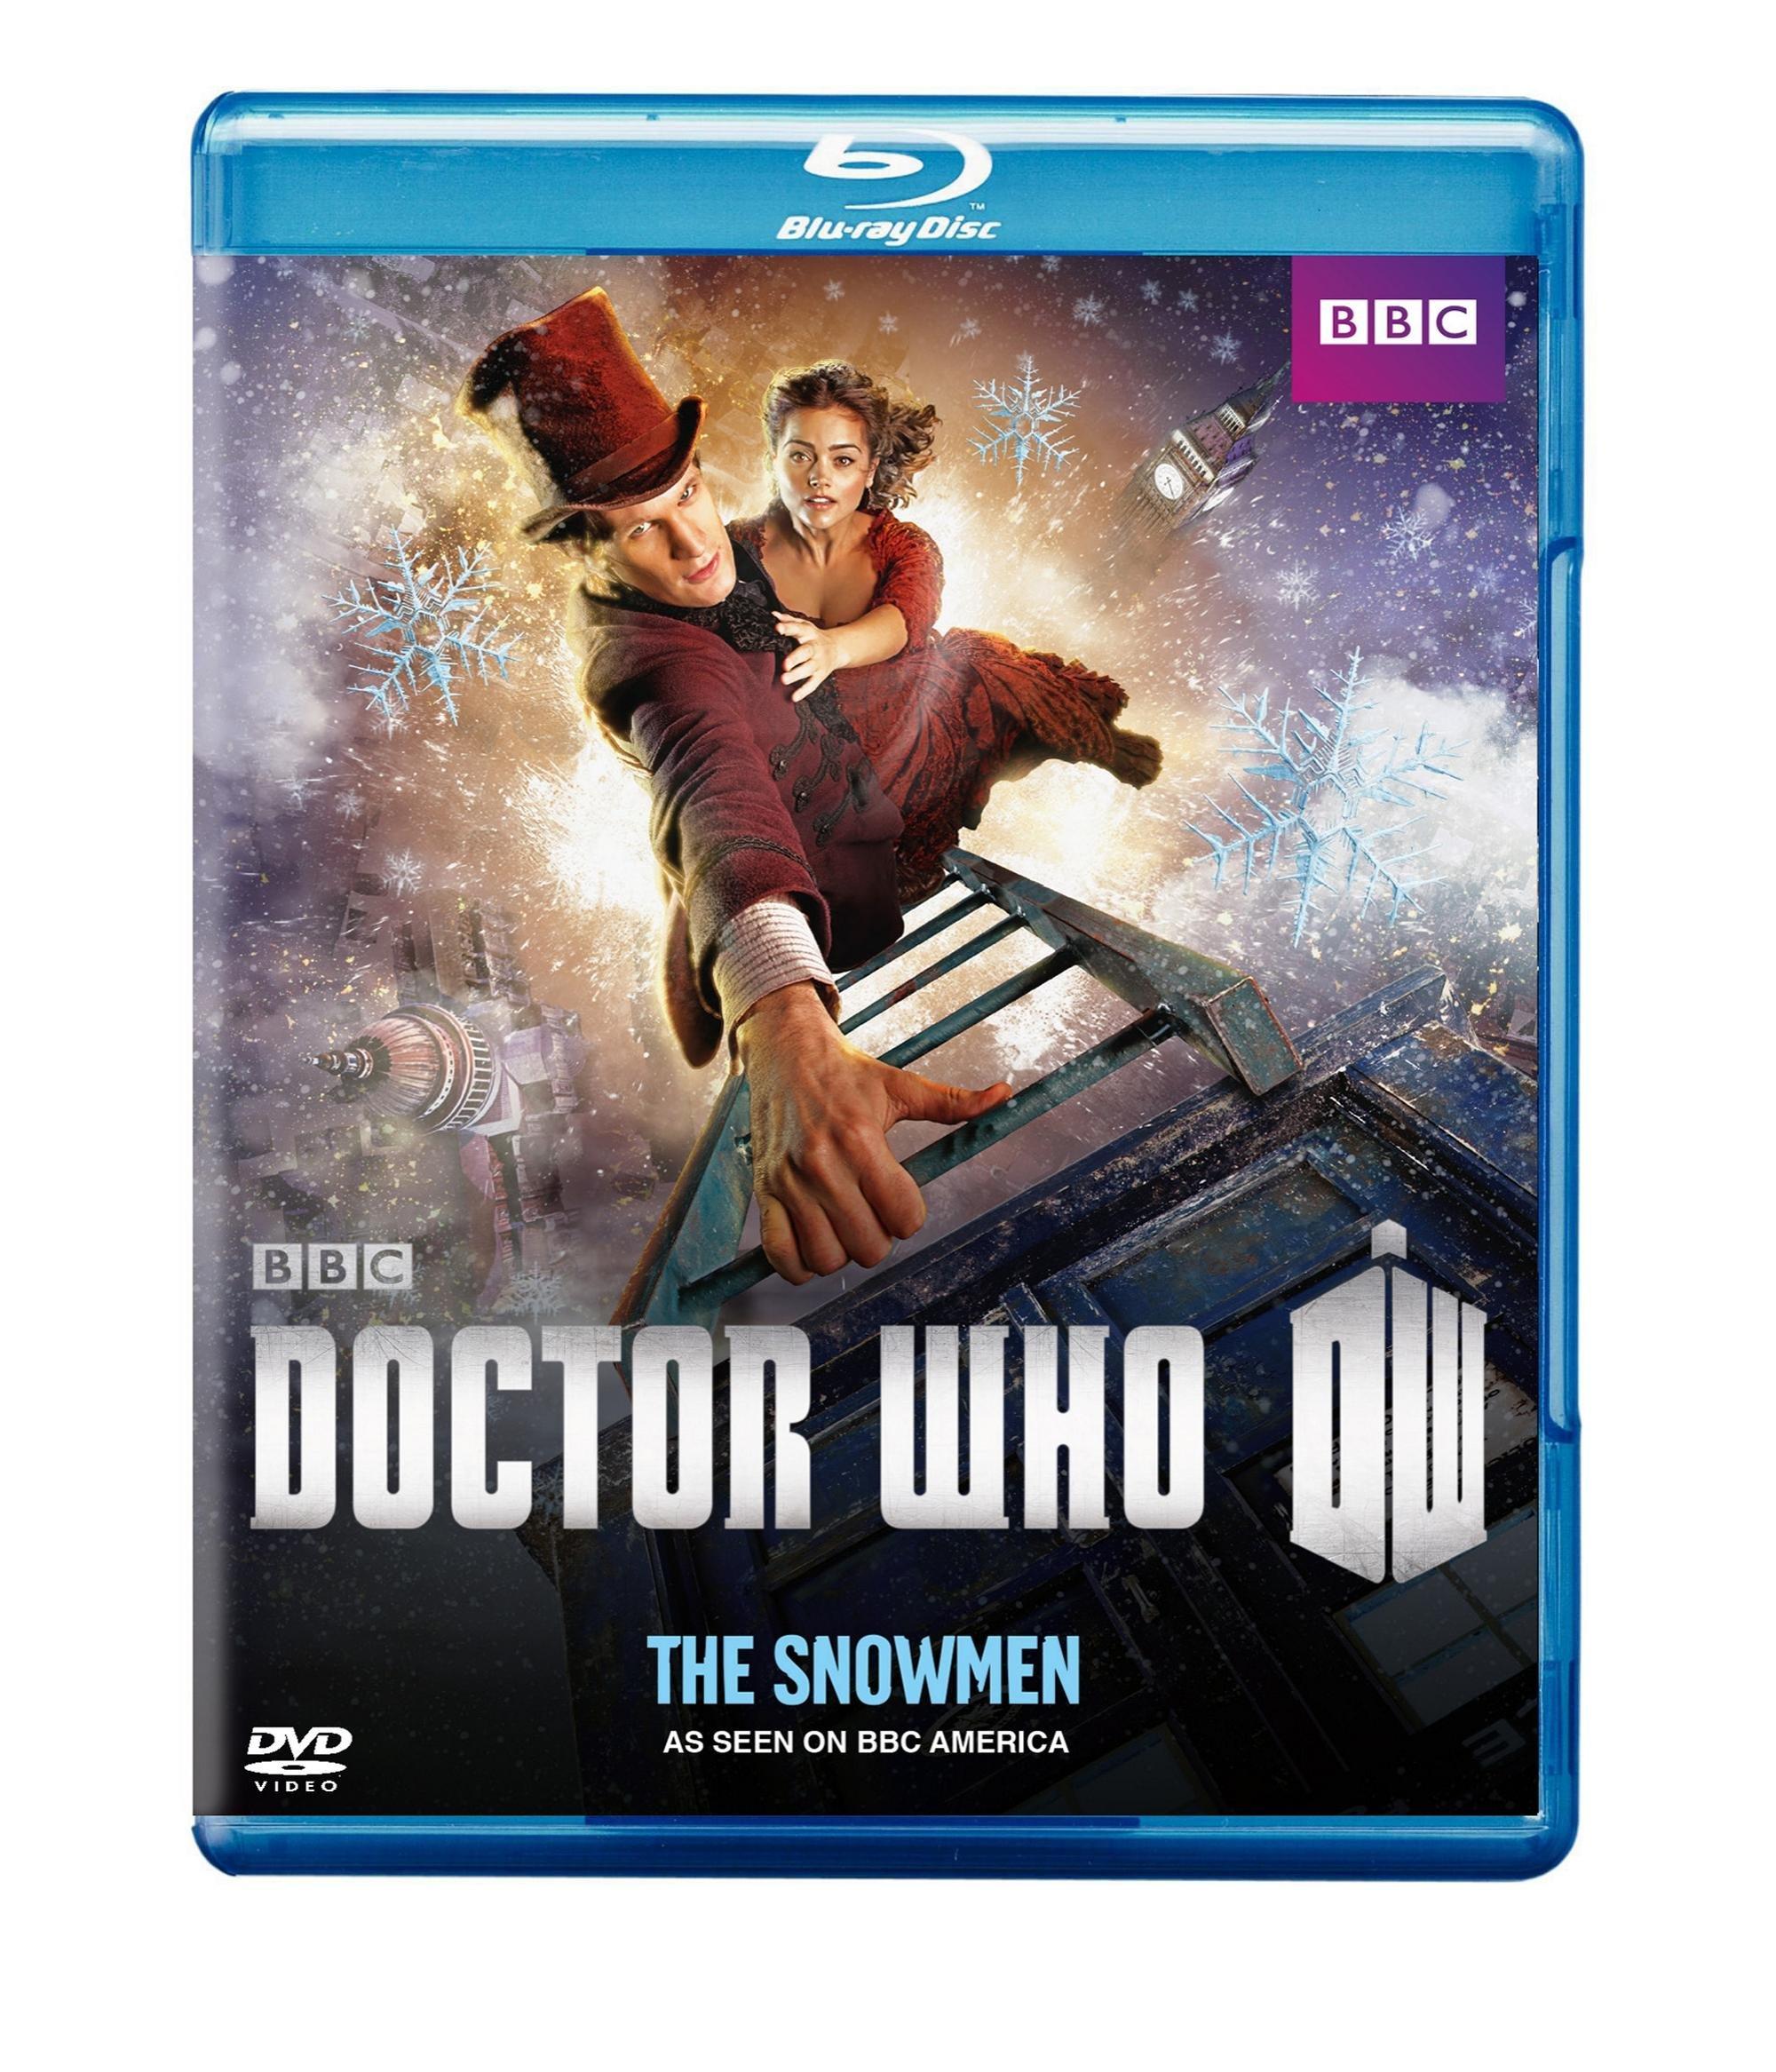 Blu-ray : Doctor Who: The Snowmen (Eco Amaray Case)